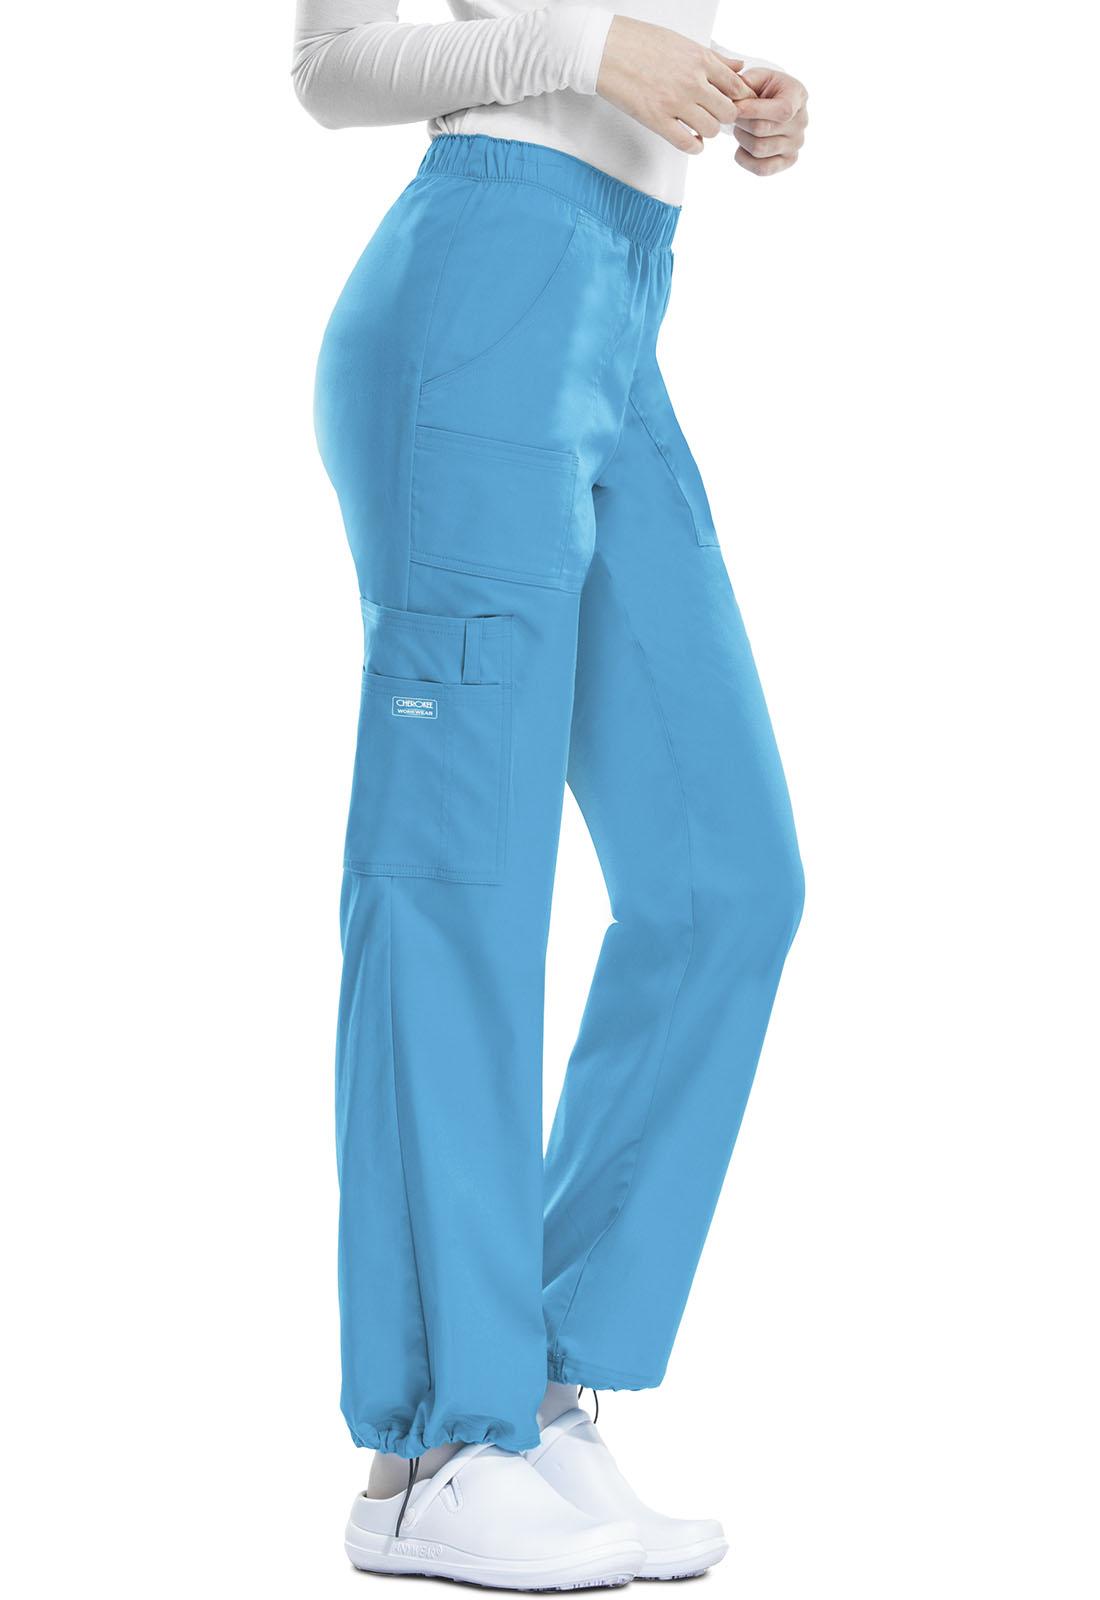 5502771b3e2 Cherokee Workwear. WW Core Stretch Mid Rise Pull-On Pant Cargo Pant in  Hawaiian Ocean